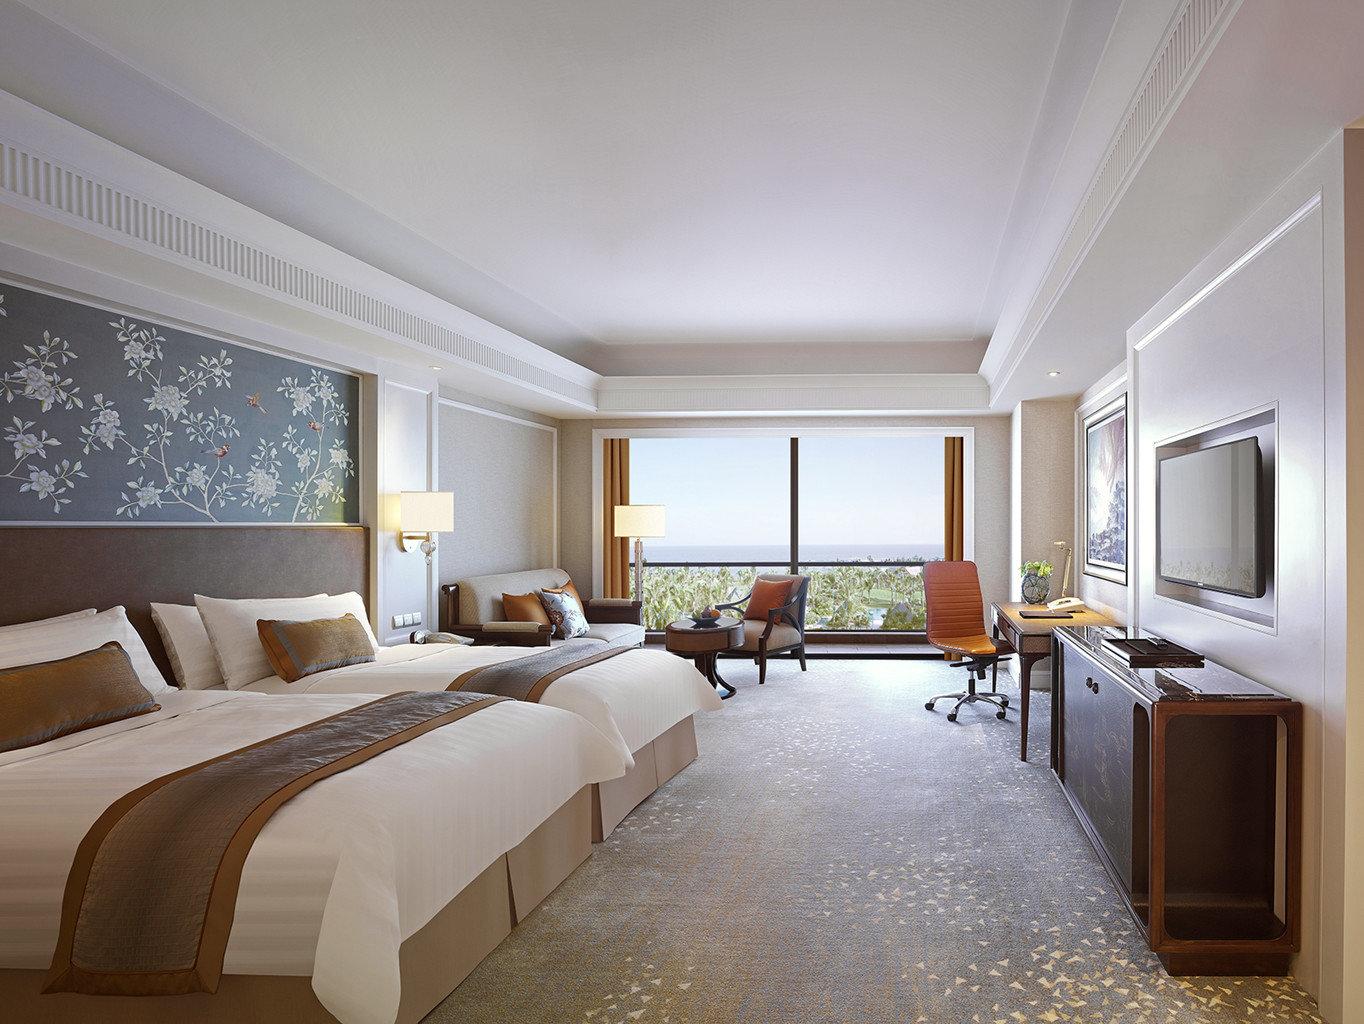 Balcony Bedroom Luxury Modern Scenic views Suite property living room home condominium mansion